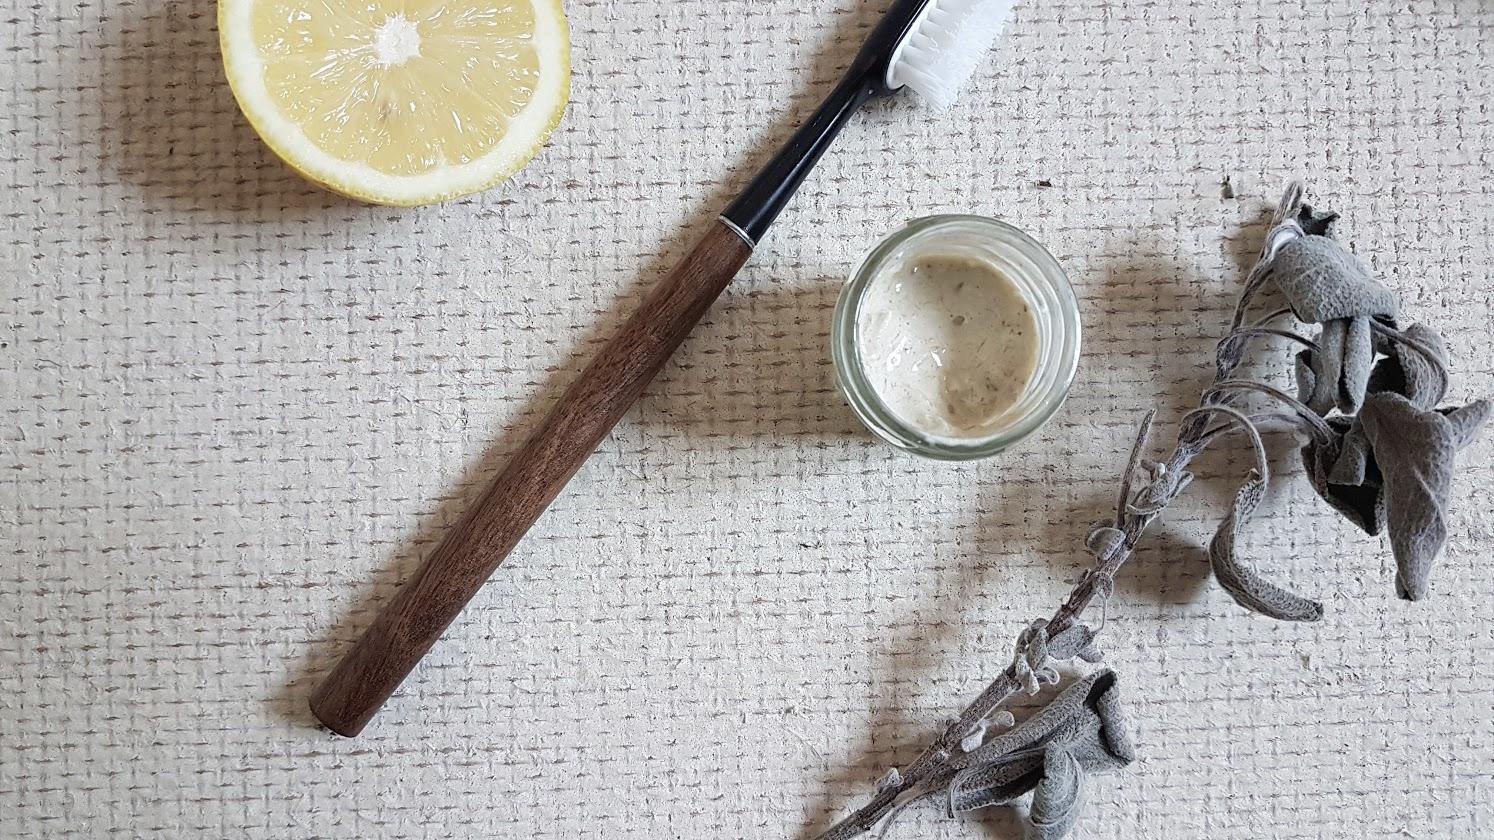 dentifrice au citron recette naturelle